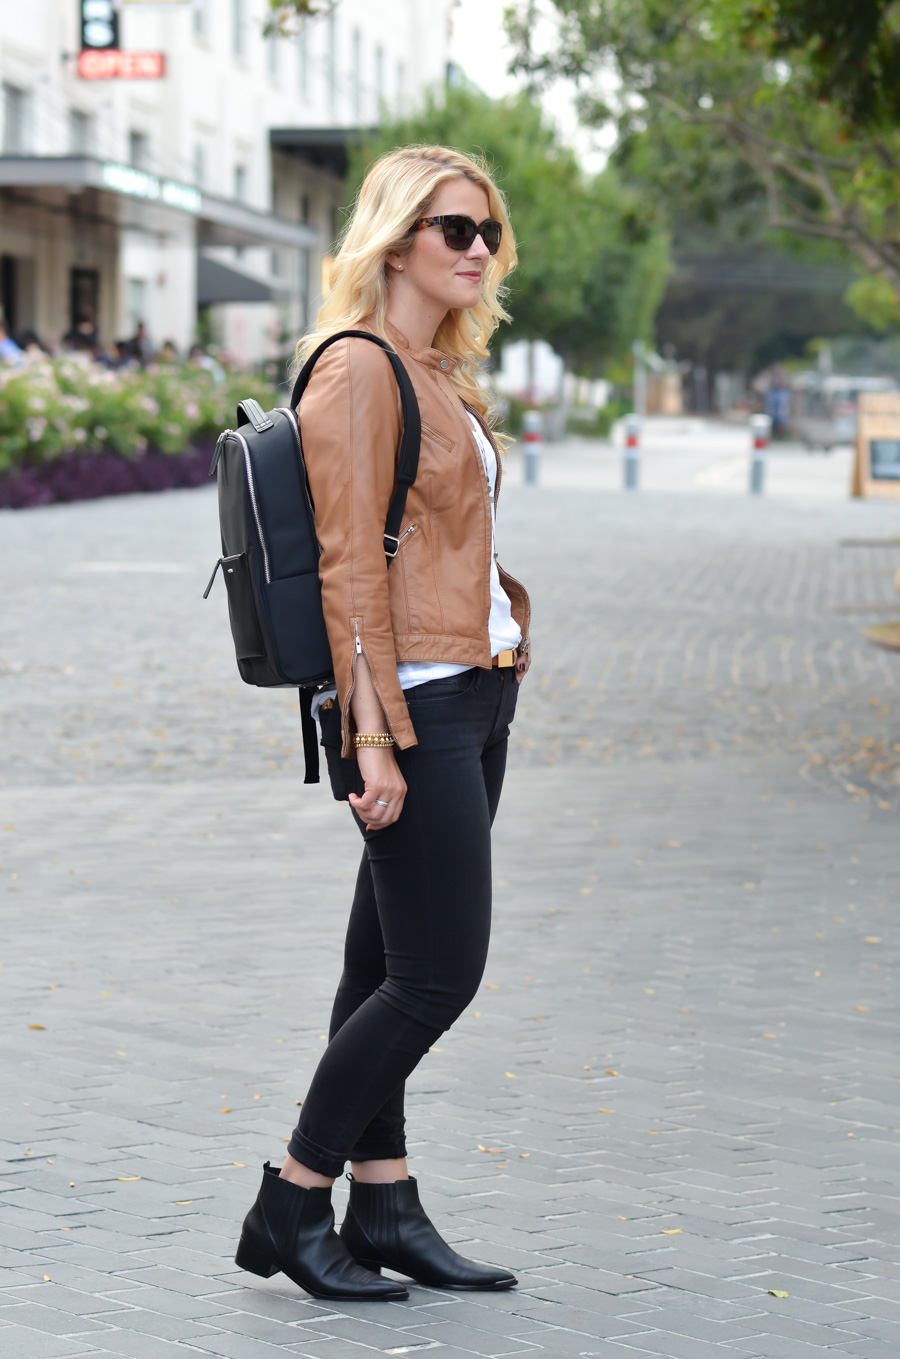 Best Travel Bags for Stylish Women. Chic Work Laptop Backpack - Samsonite Zalia Backpack Review